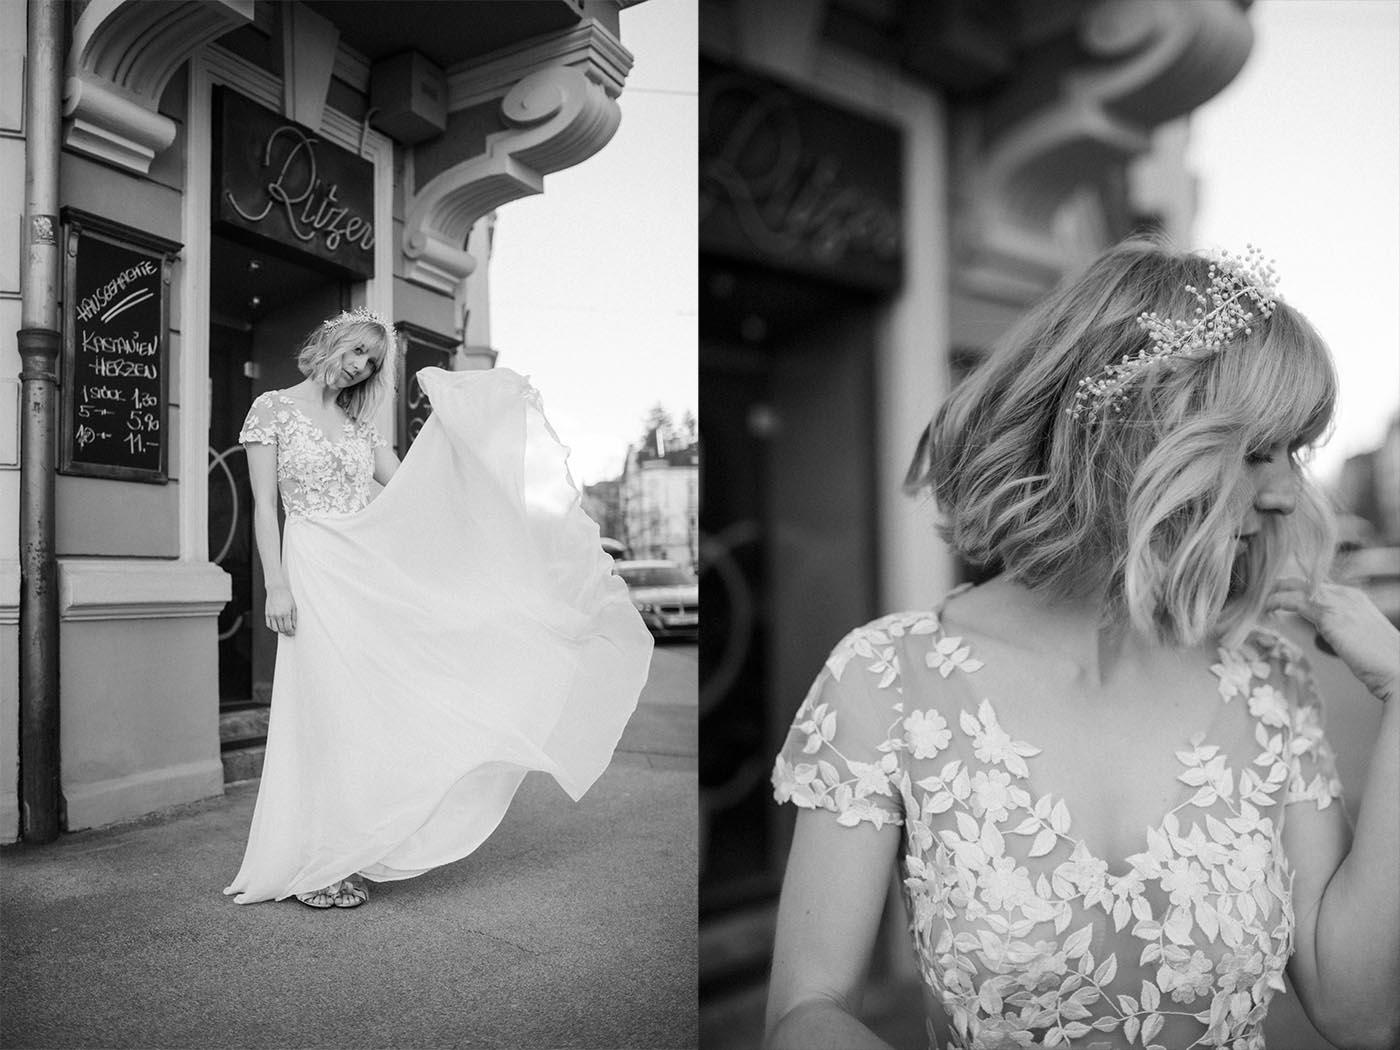 Brautkleider von Goldcircus Studio